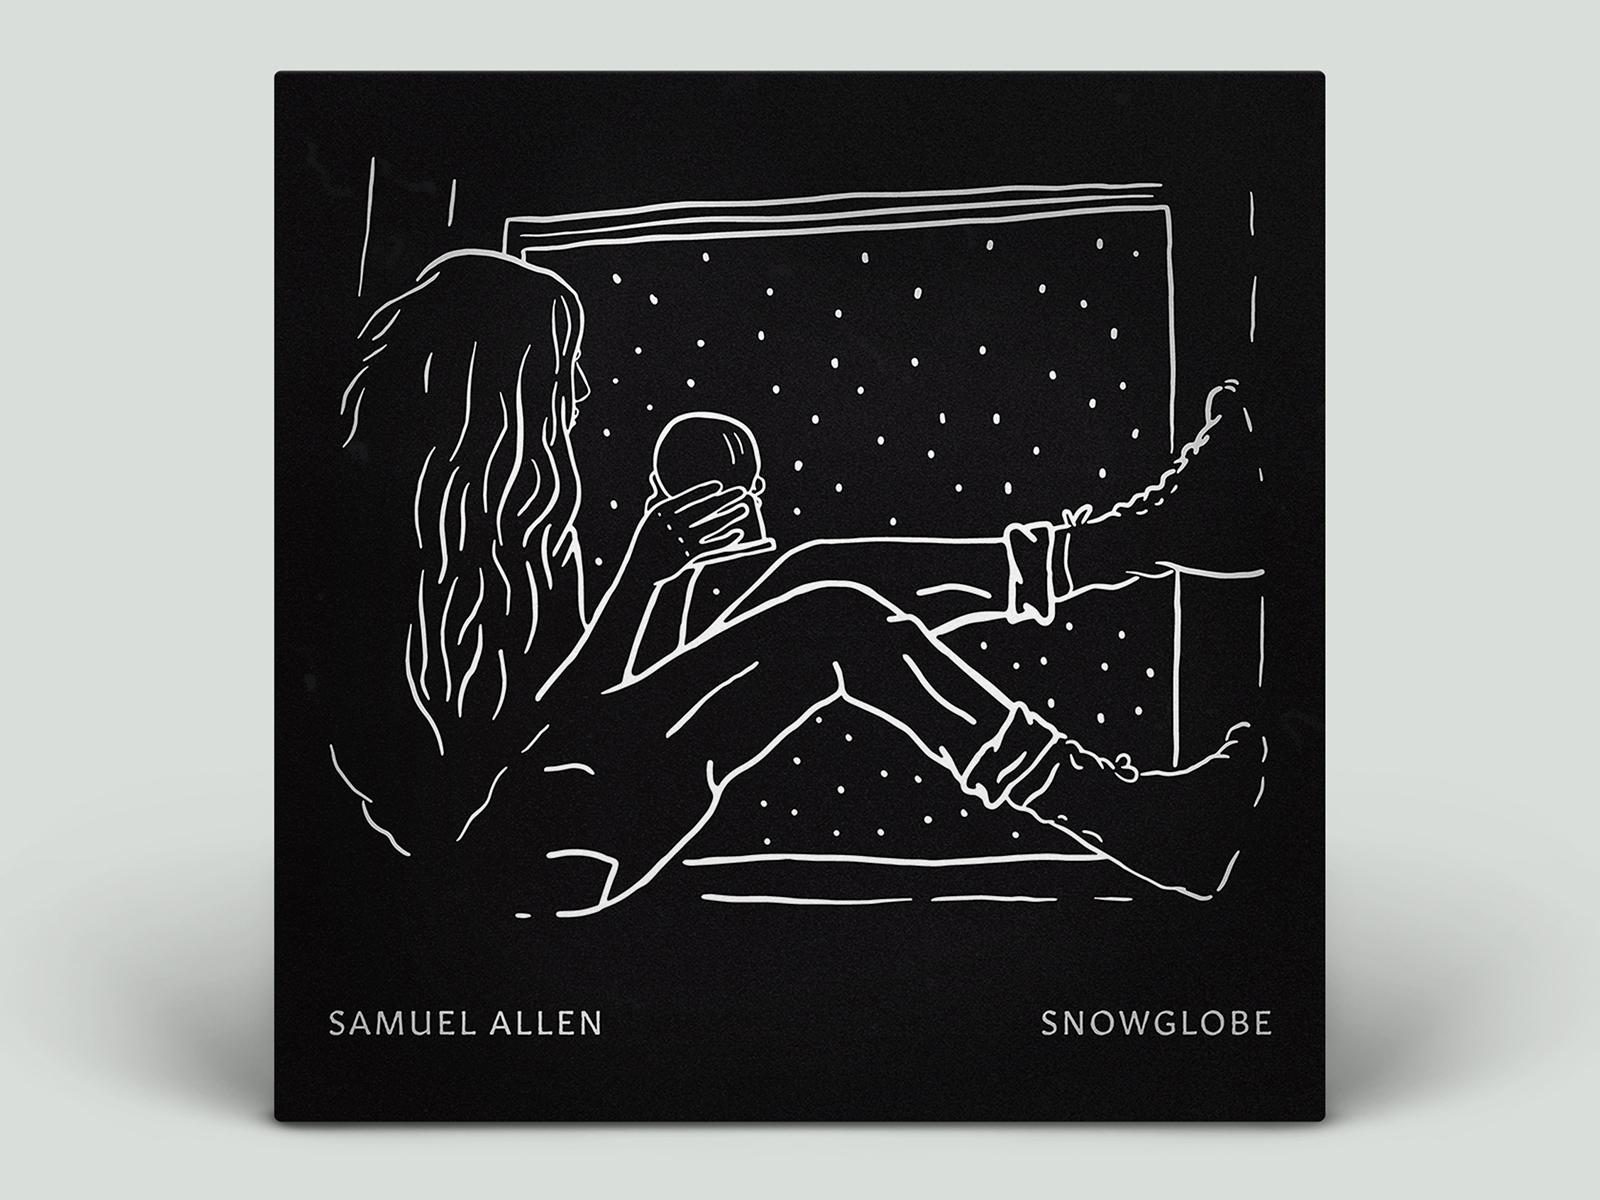 Snowglobealbumcover